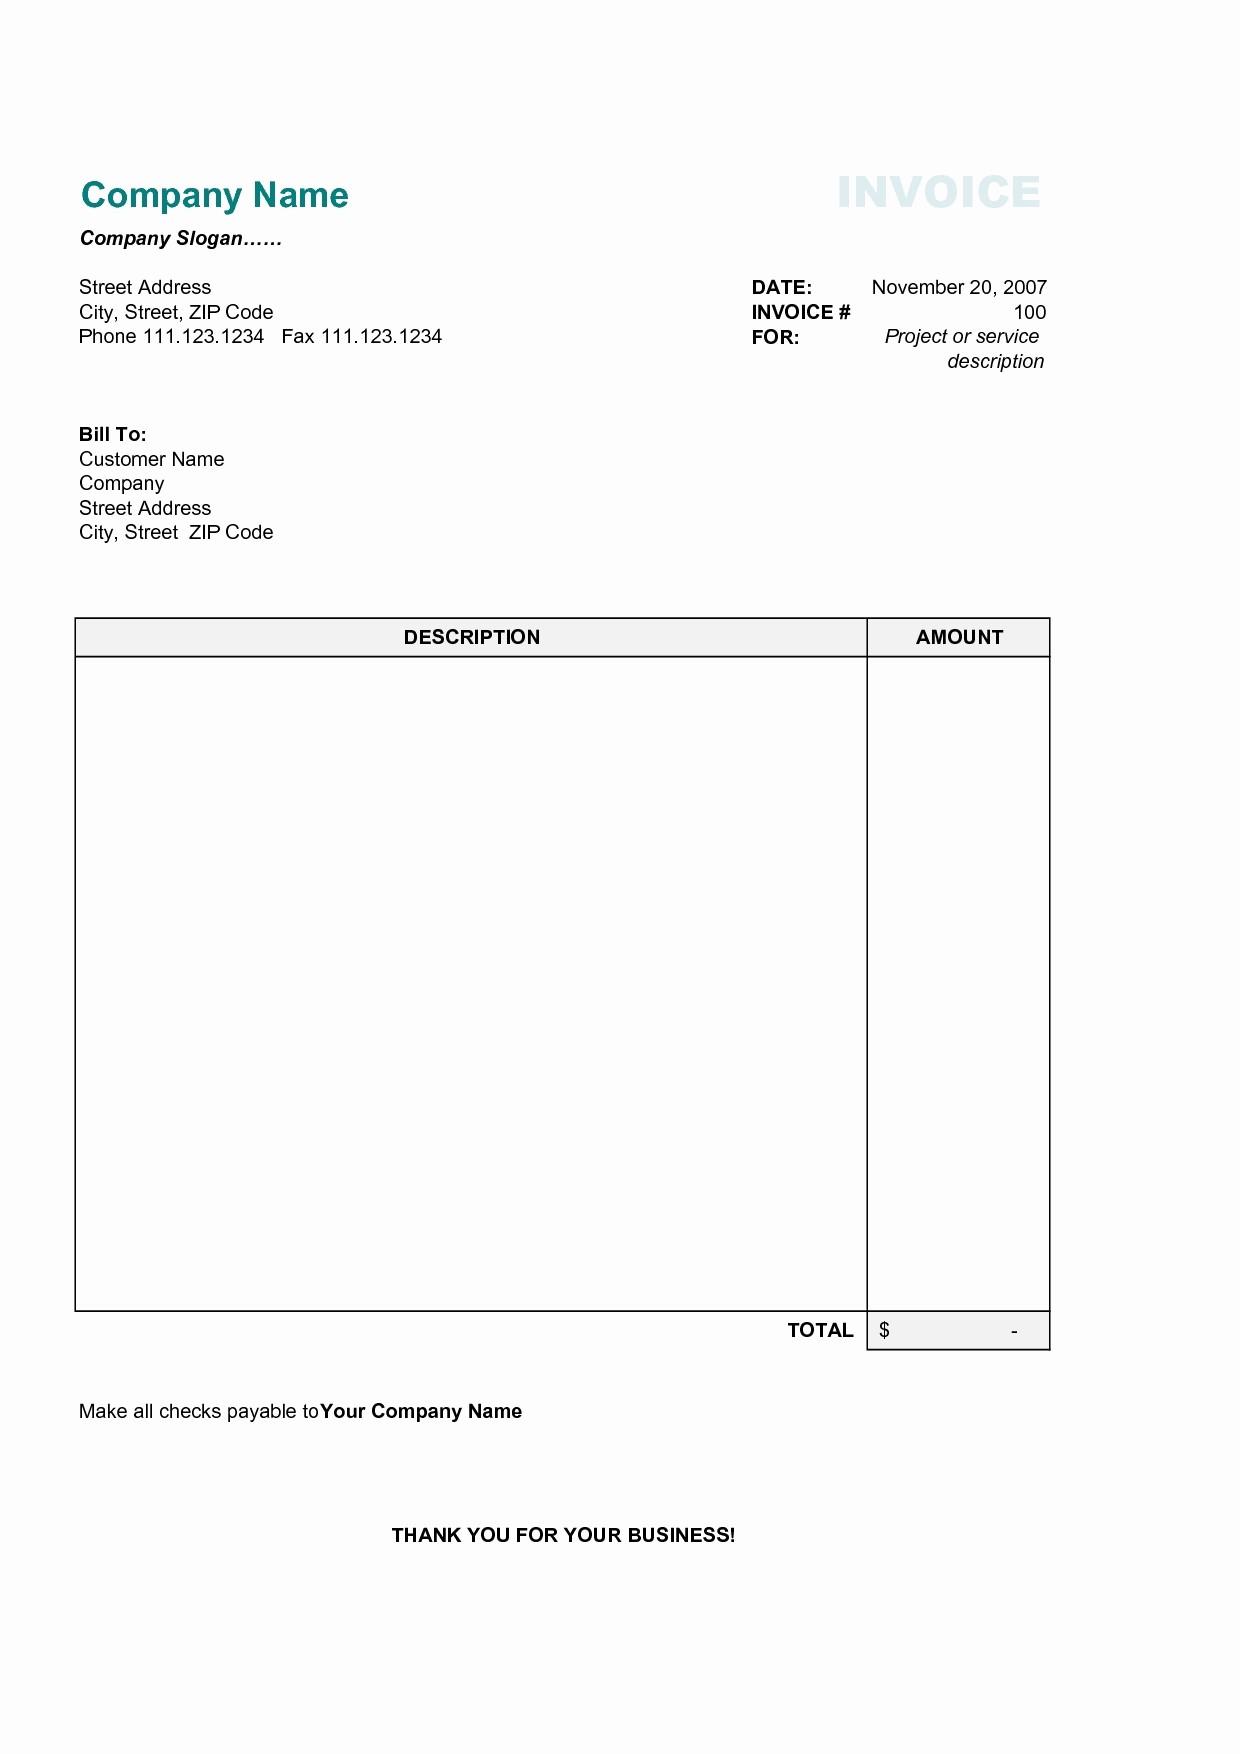 Free Printable Invoice Templates Word Beautiful Simple Invoice Template Pdf Invoice Template Ideas